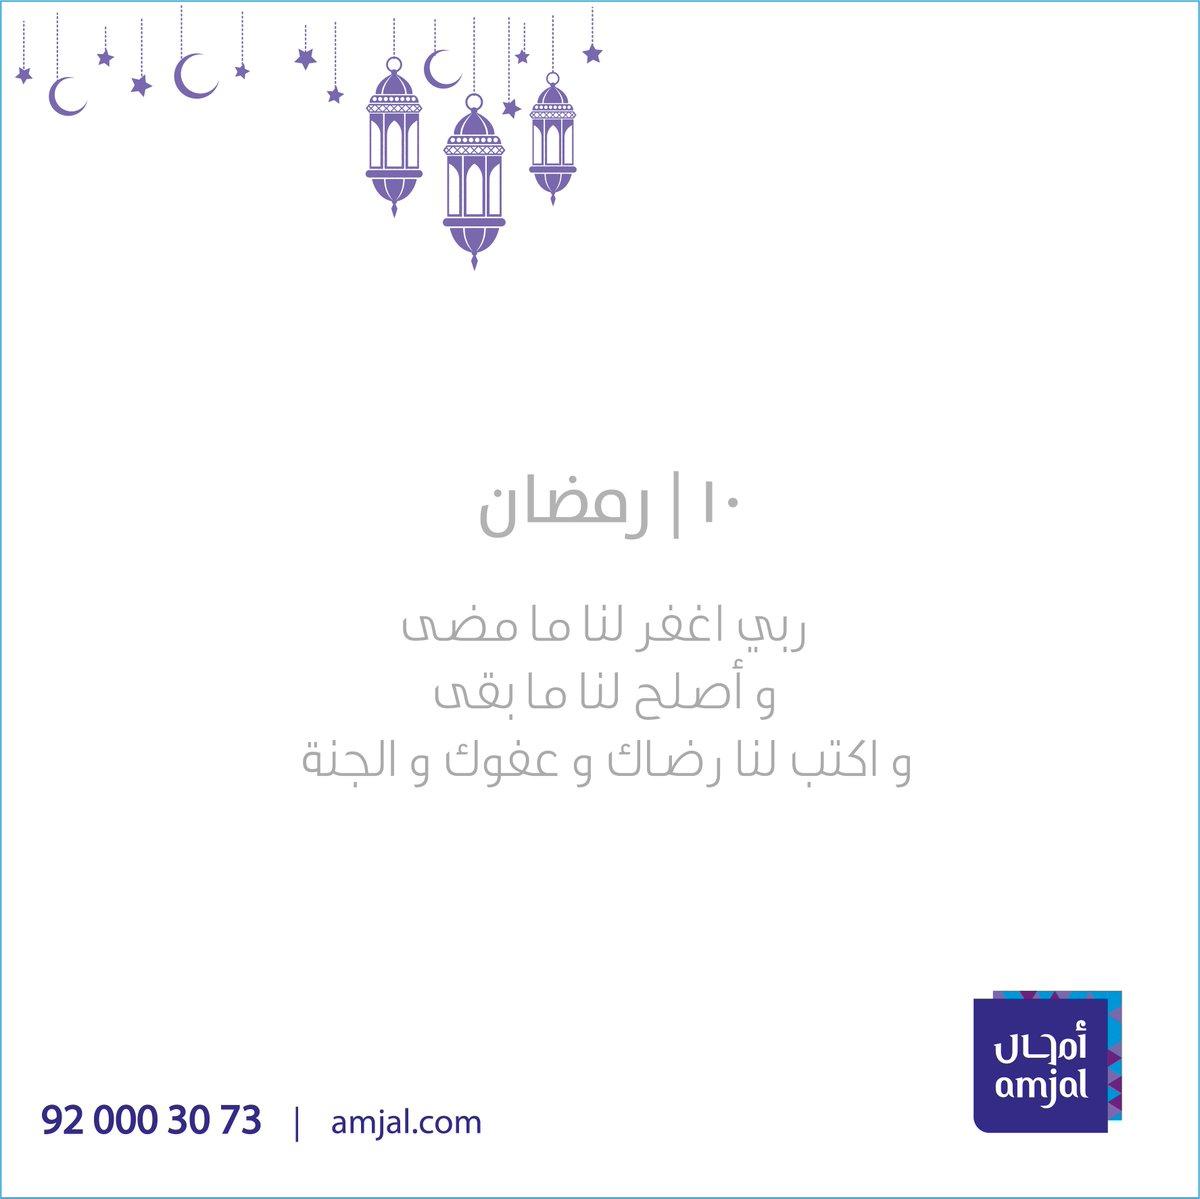 #دعاء_رمضان https://t.co/OIbTzweilA